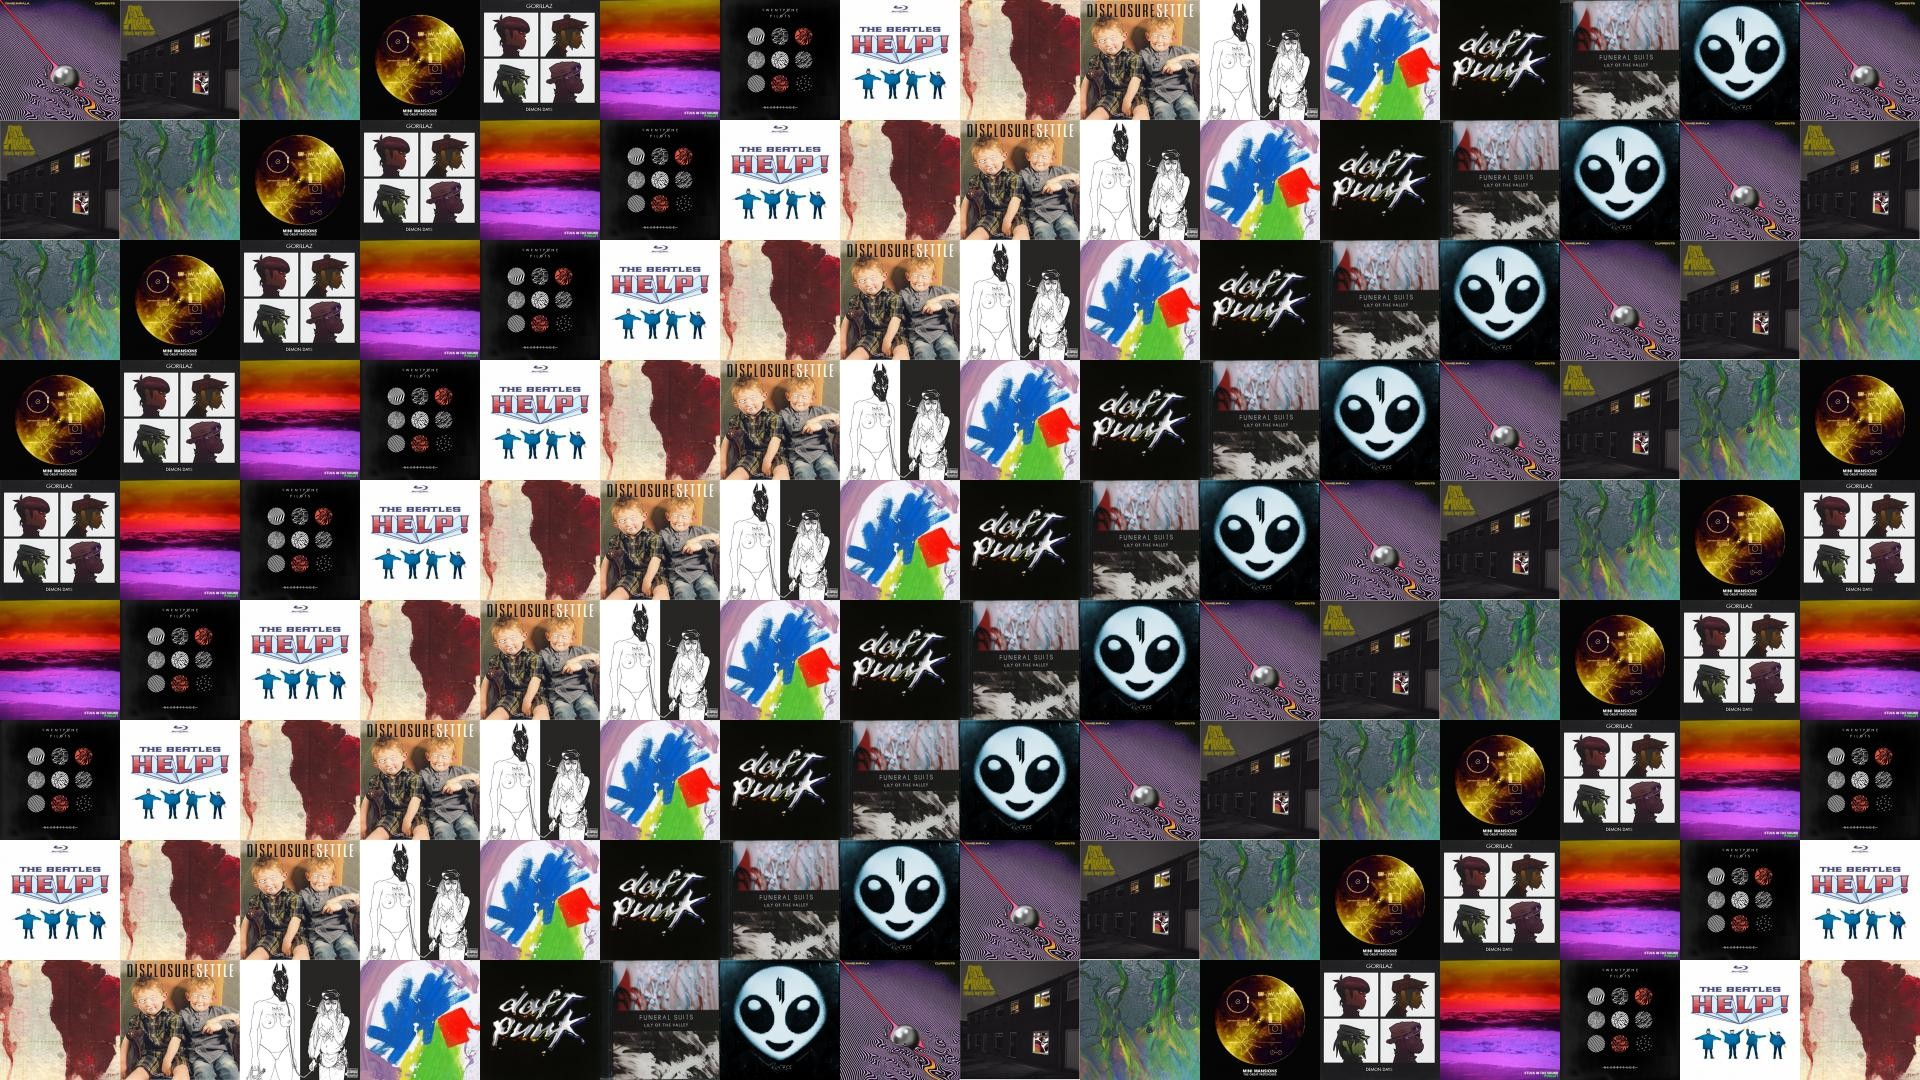 Tame Impala Currents Arctic Monkeys Favorite Worst Nightmare Wallpaper Â«  Tiled Desktop Wallpaper